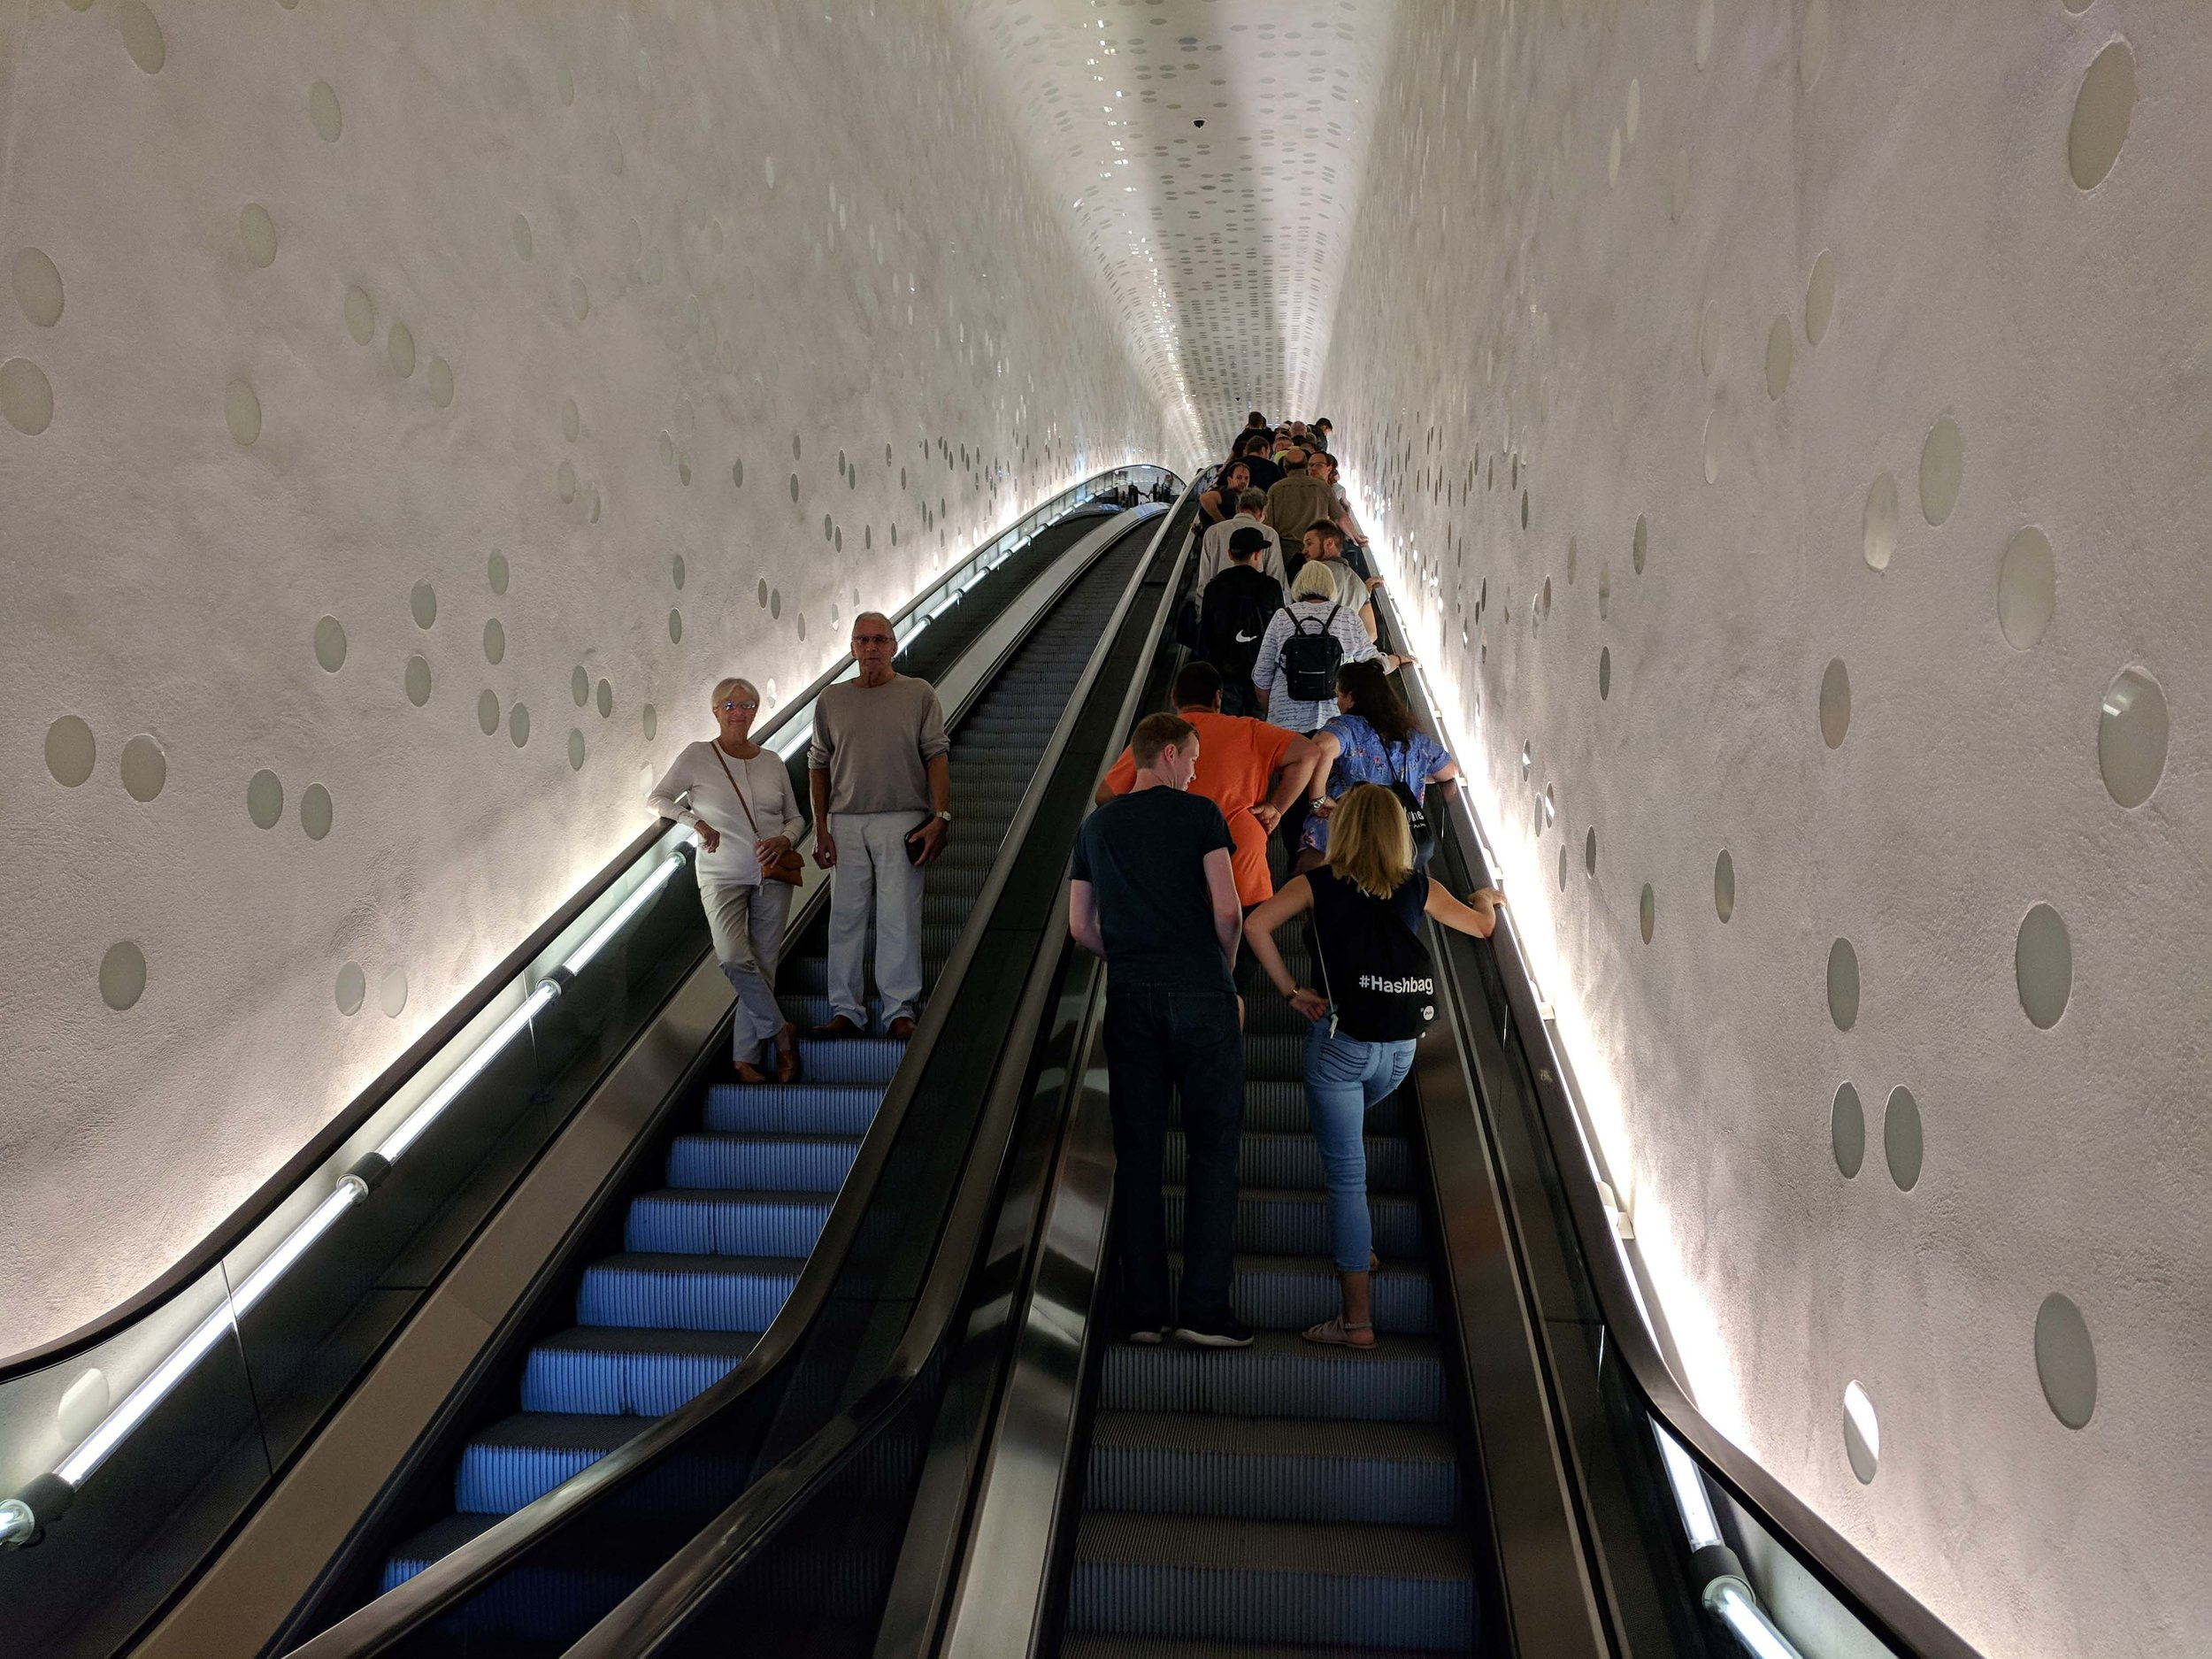 Riding the escalator to the Plaza of the Elbephilarmonie